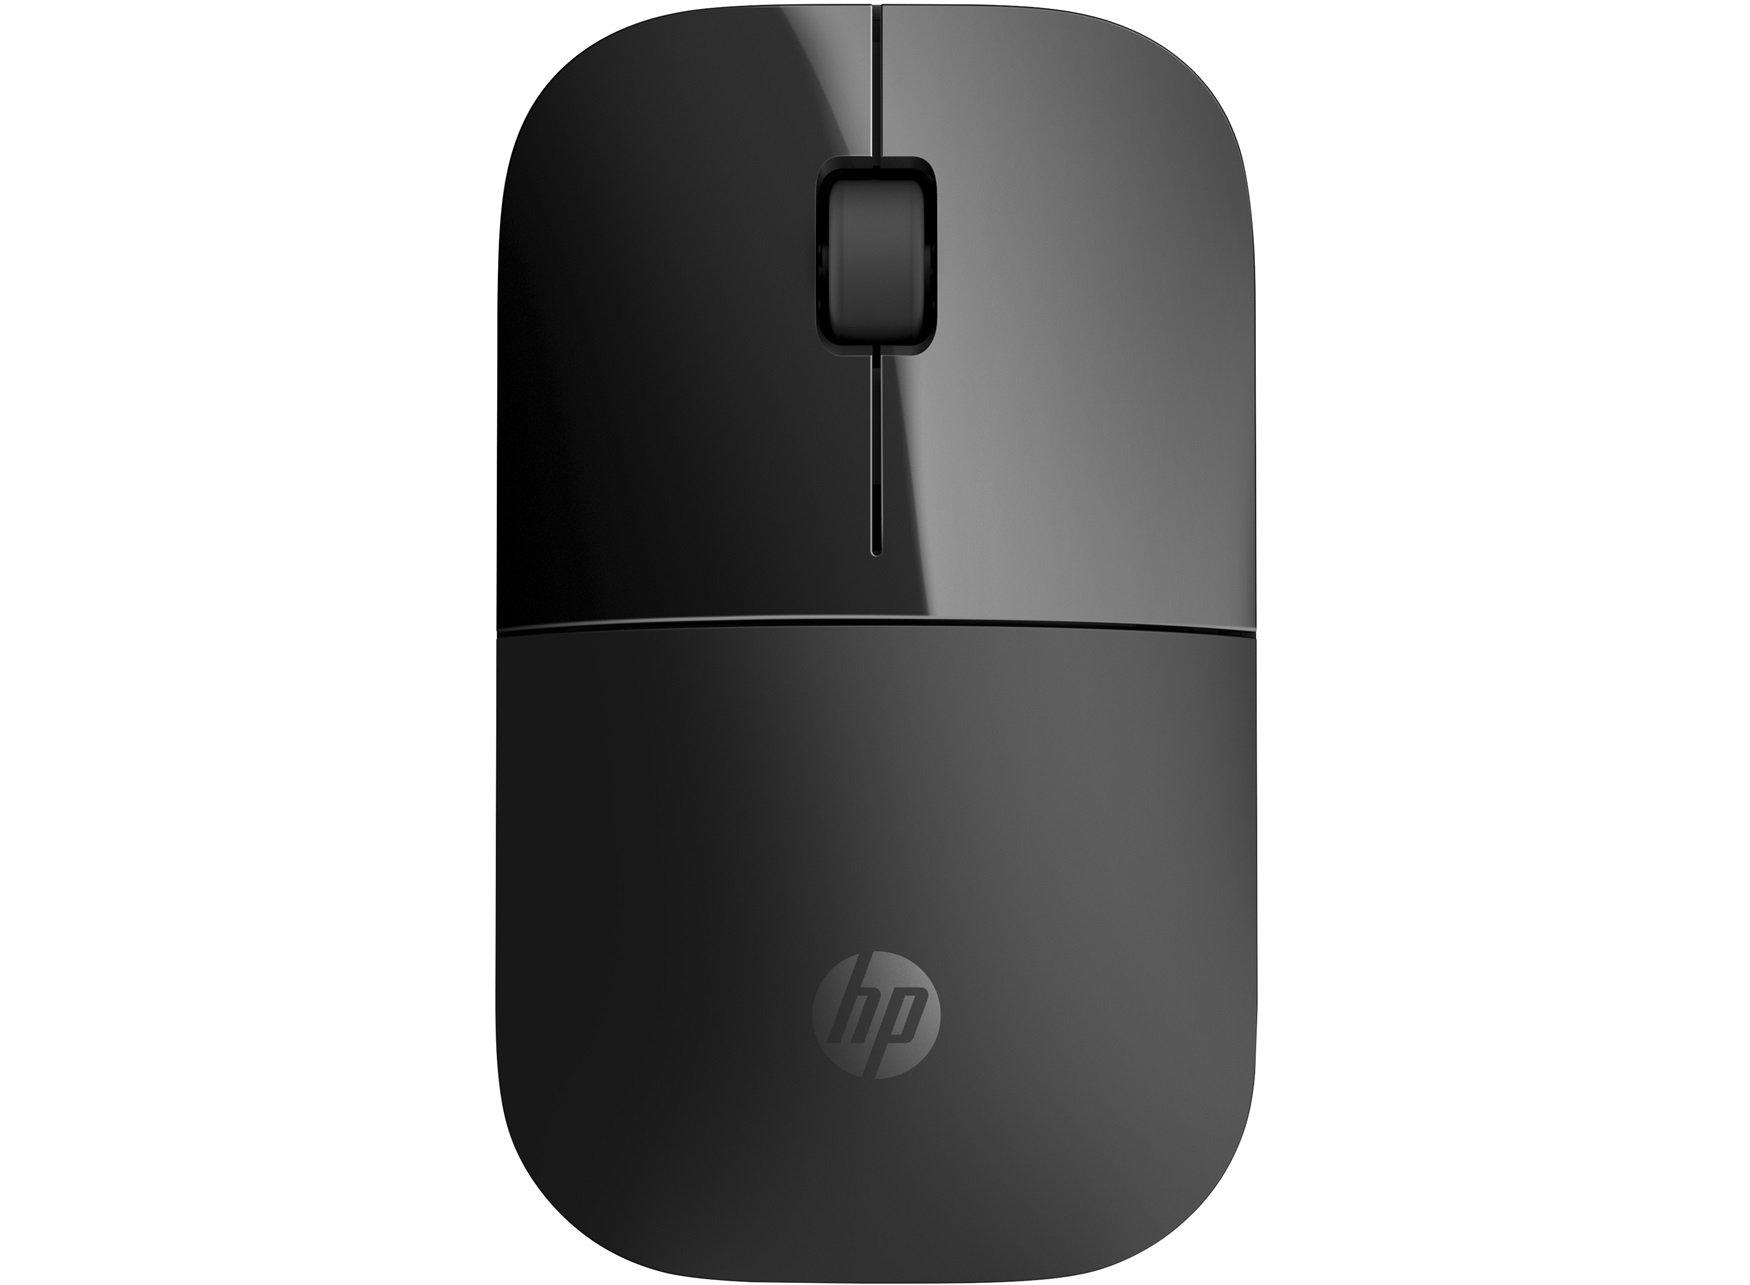 HP Wireless Mouse Z3700, Black (V0L79AA#ABL) by HP